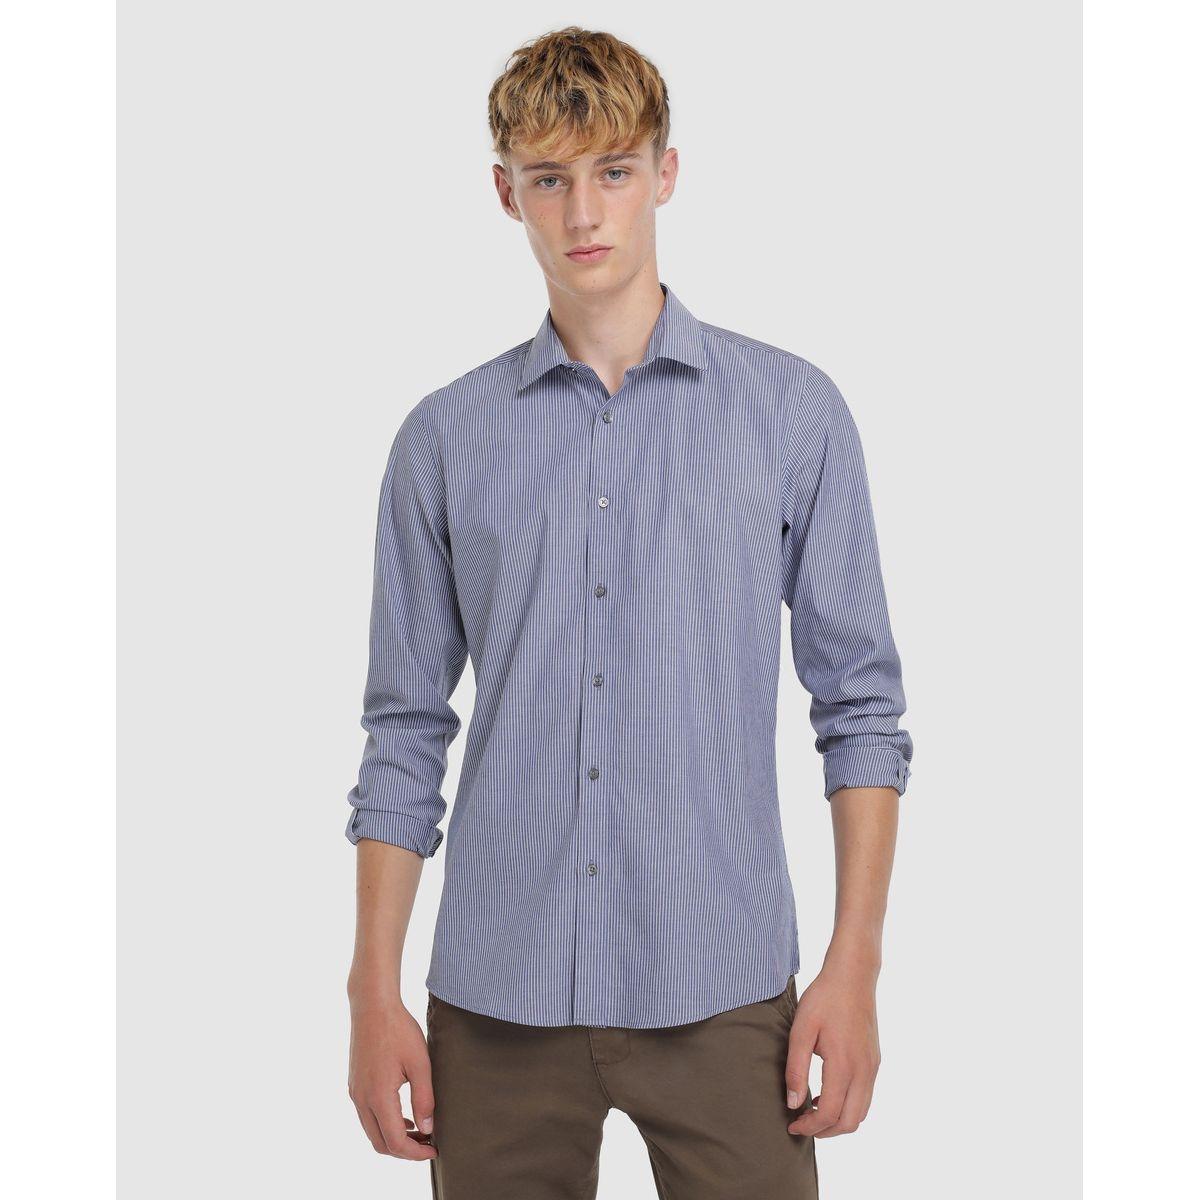 Chemise skinny habillée repassage facile  à rayures